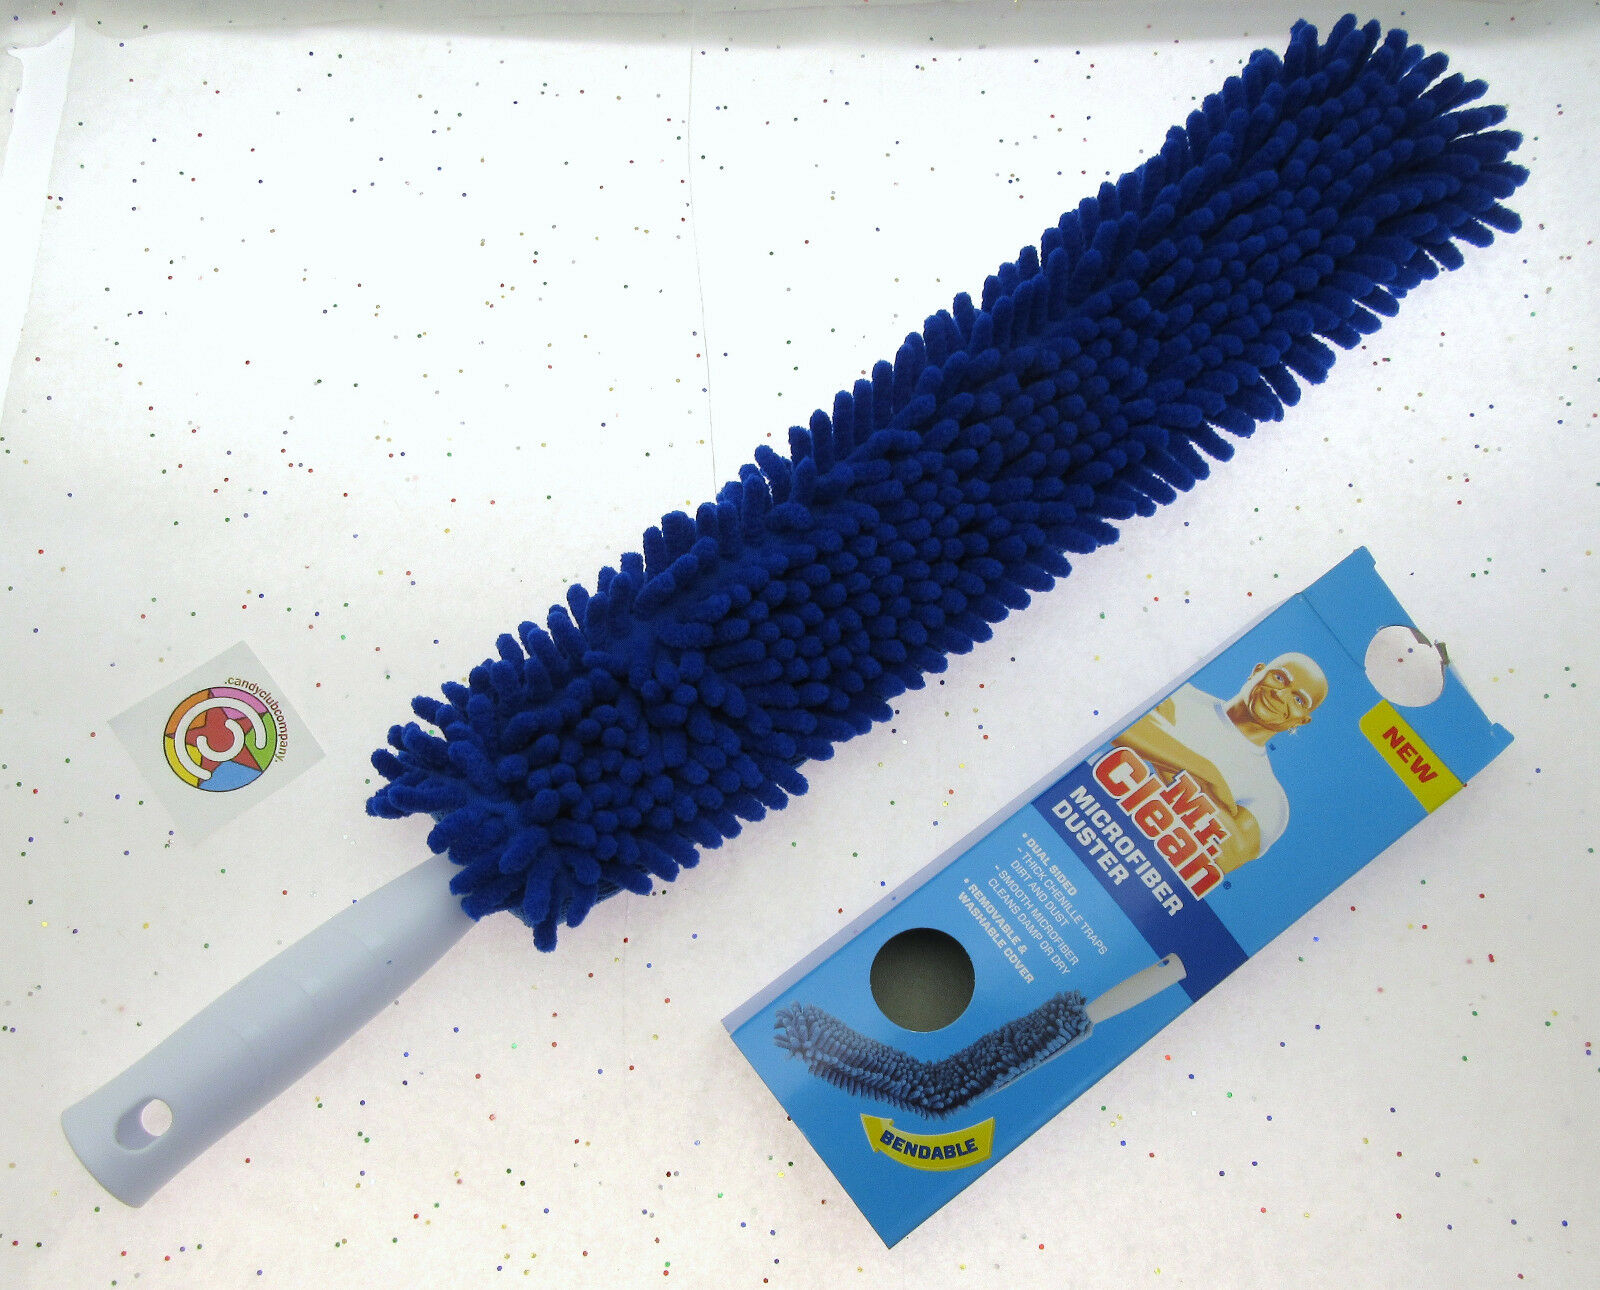 Clean Microfiber Duster-Bendable Mr